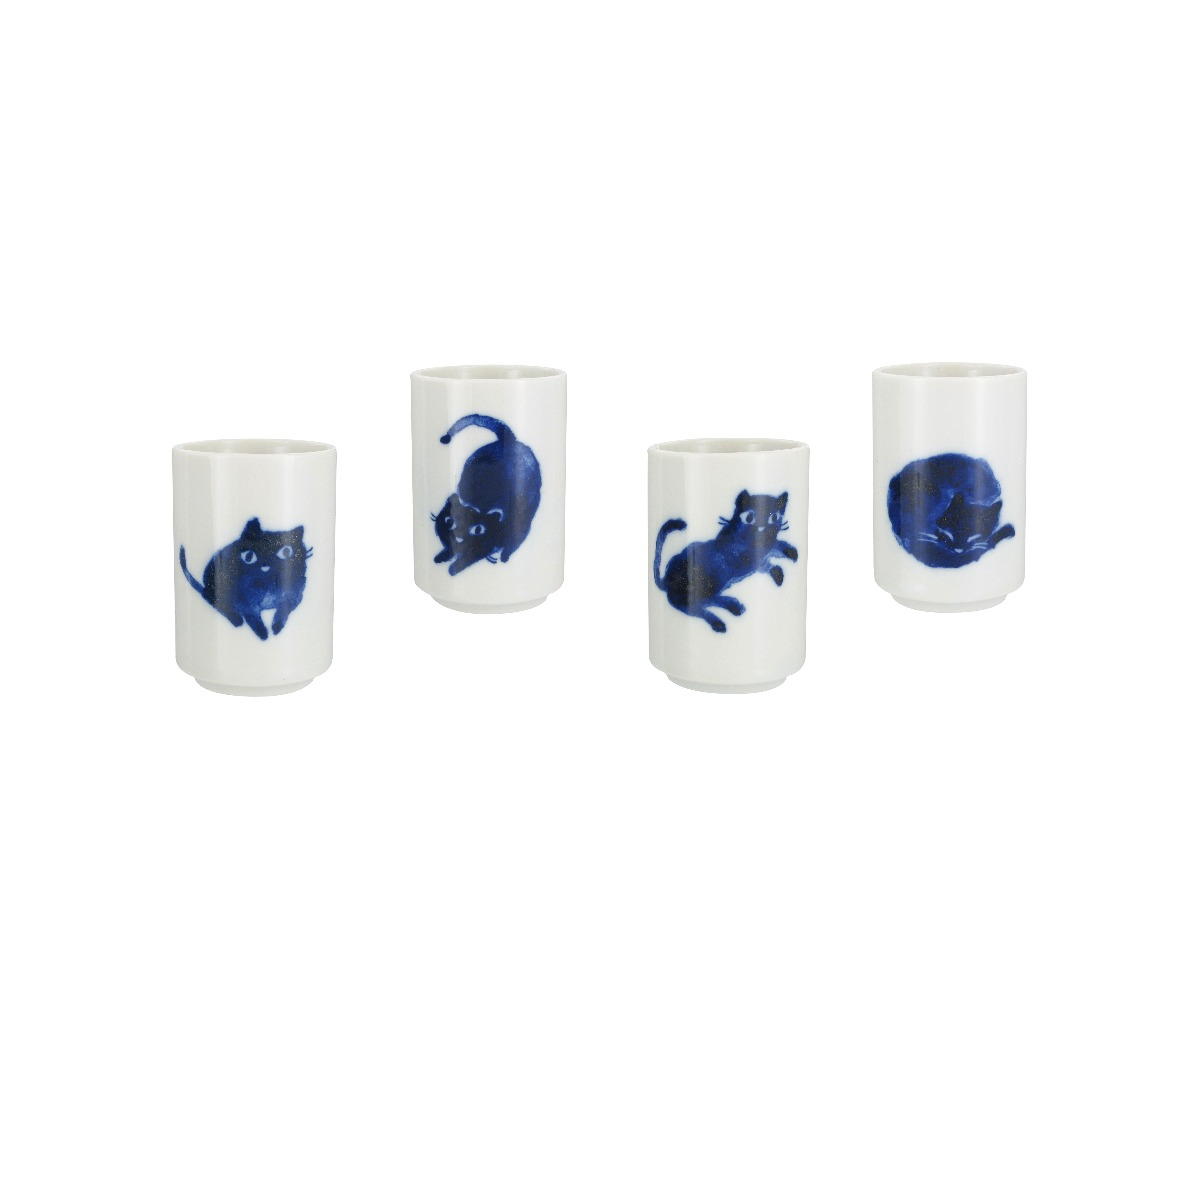 Cat cups (set of 4)